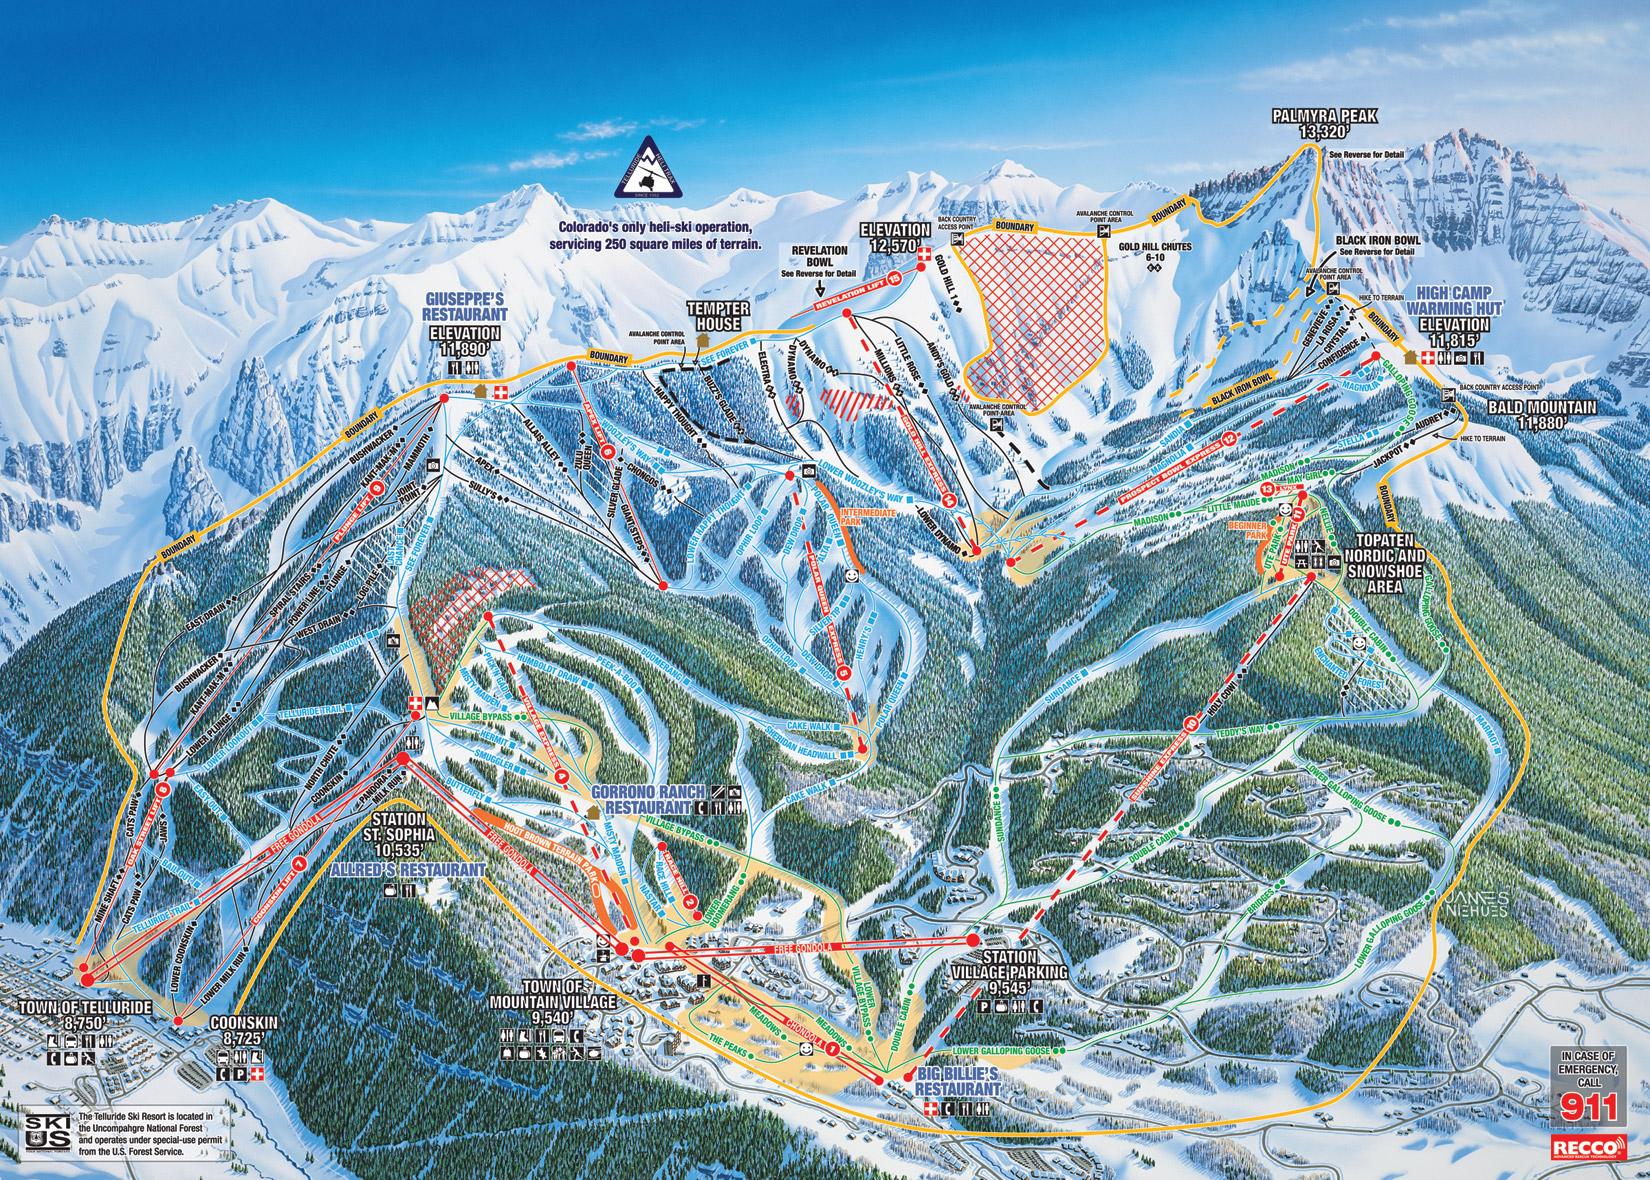 telluride ski resort ranks 5th overall best ski resort in north